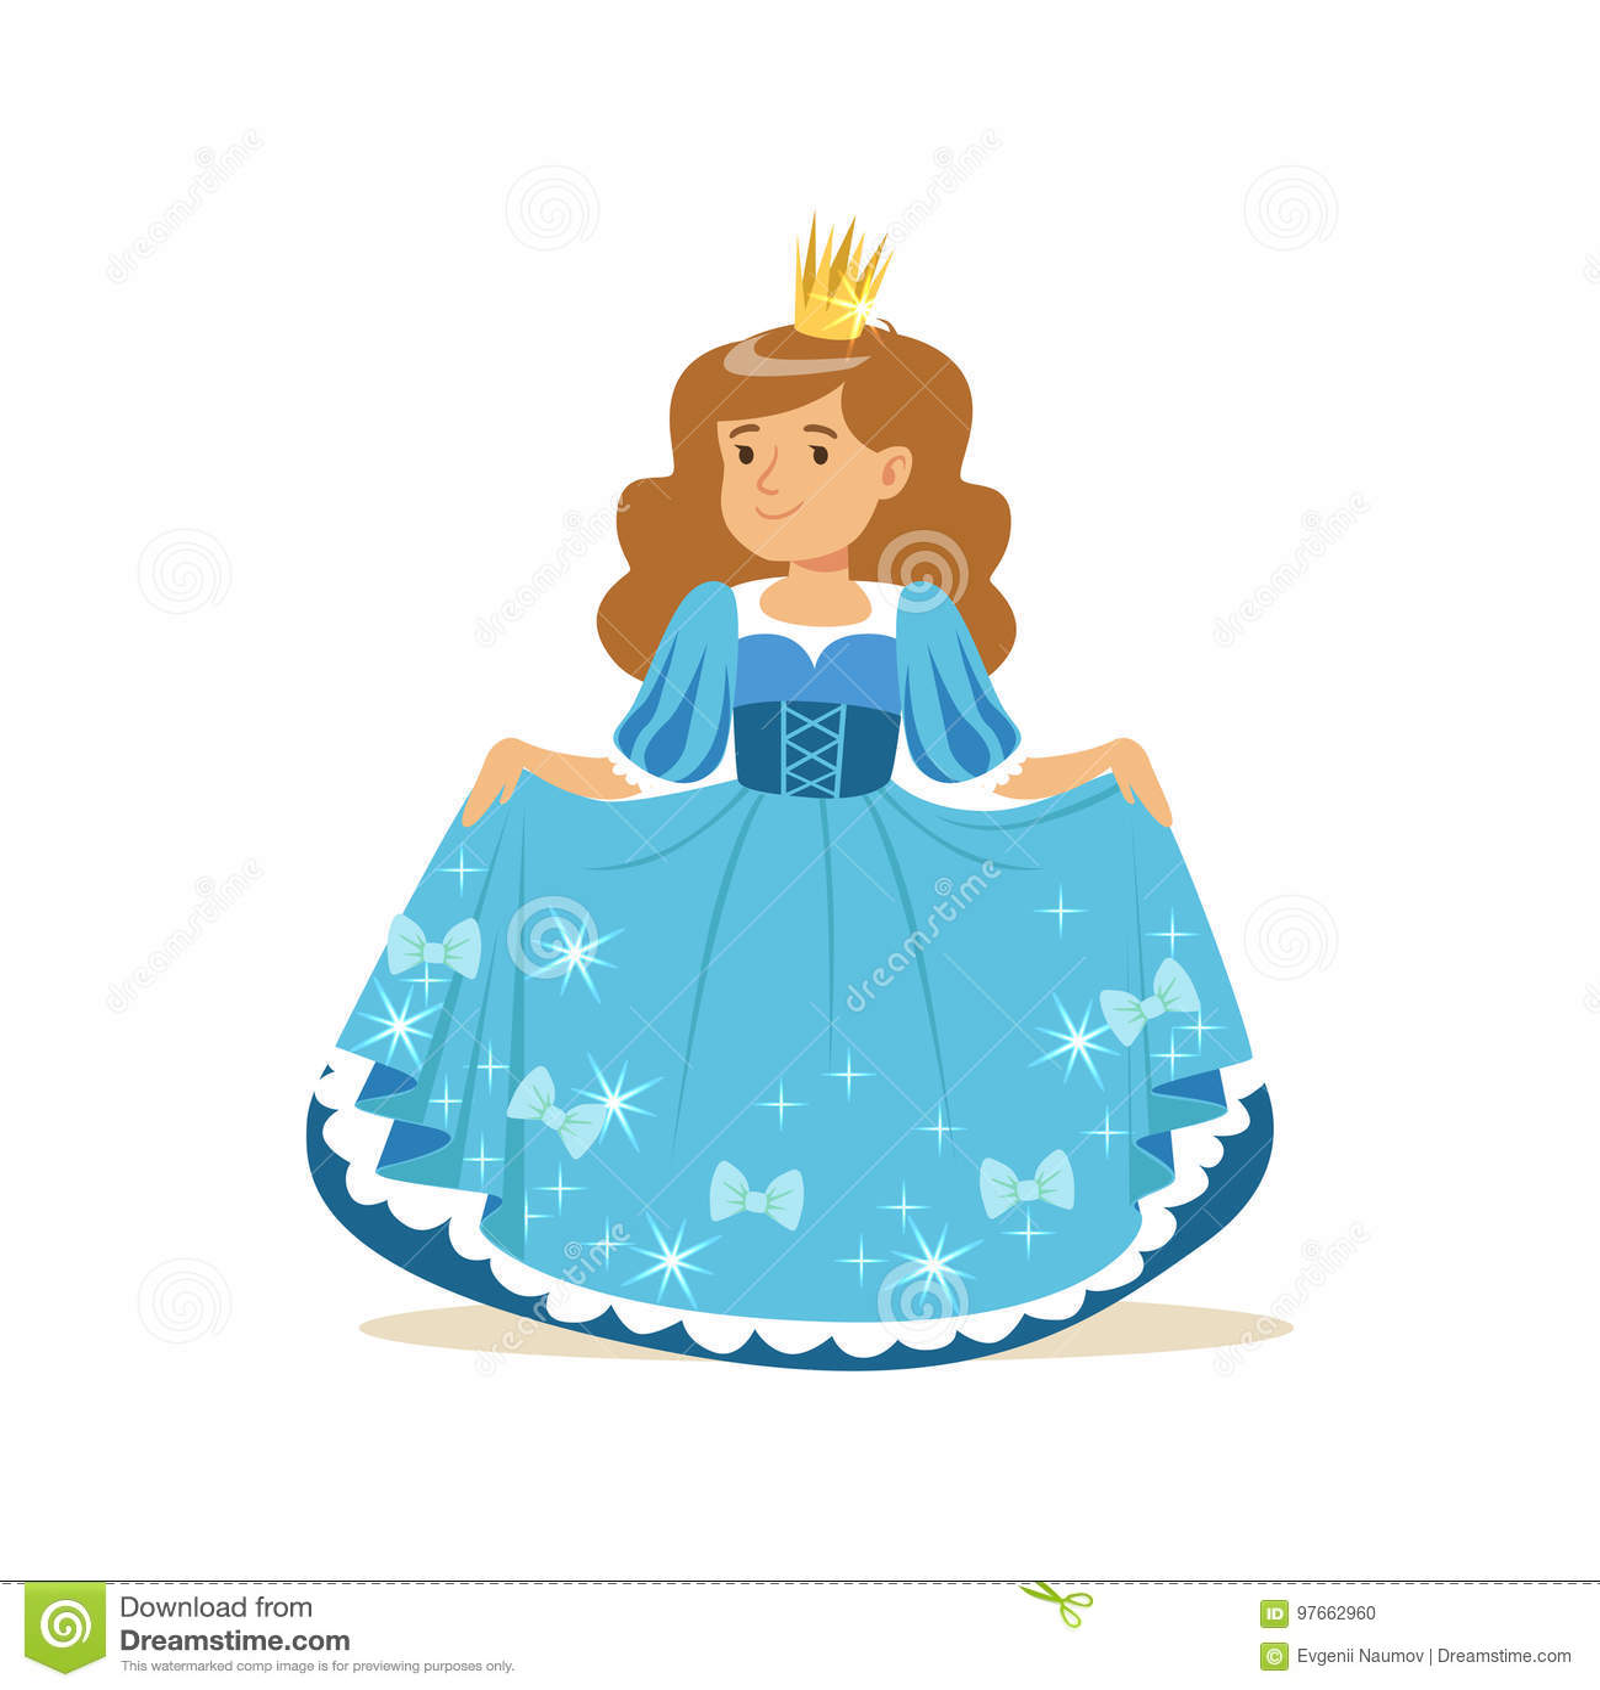 Beautiful Little Girl Princess In A Blue Ball Dress And Golden Crown ...